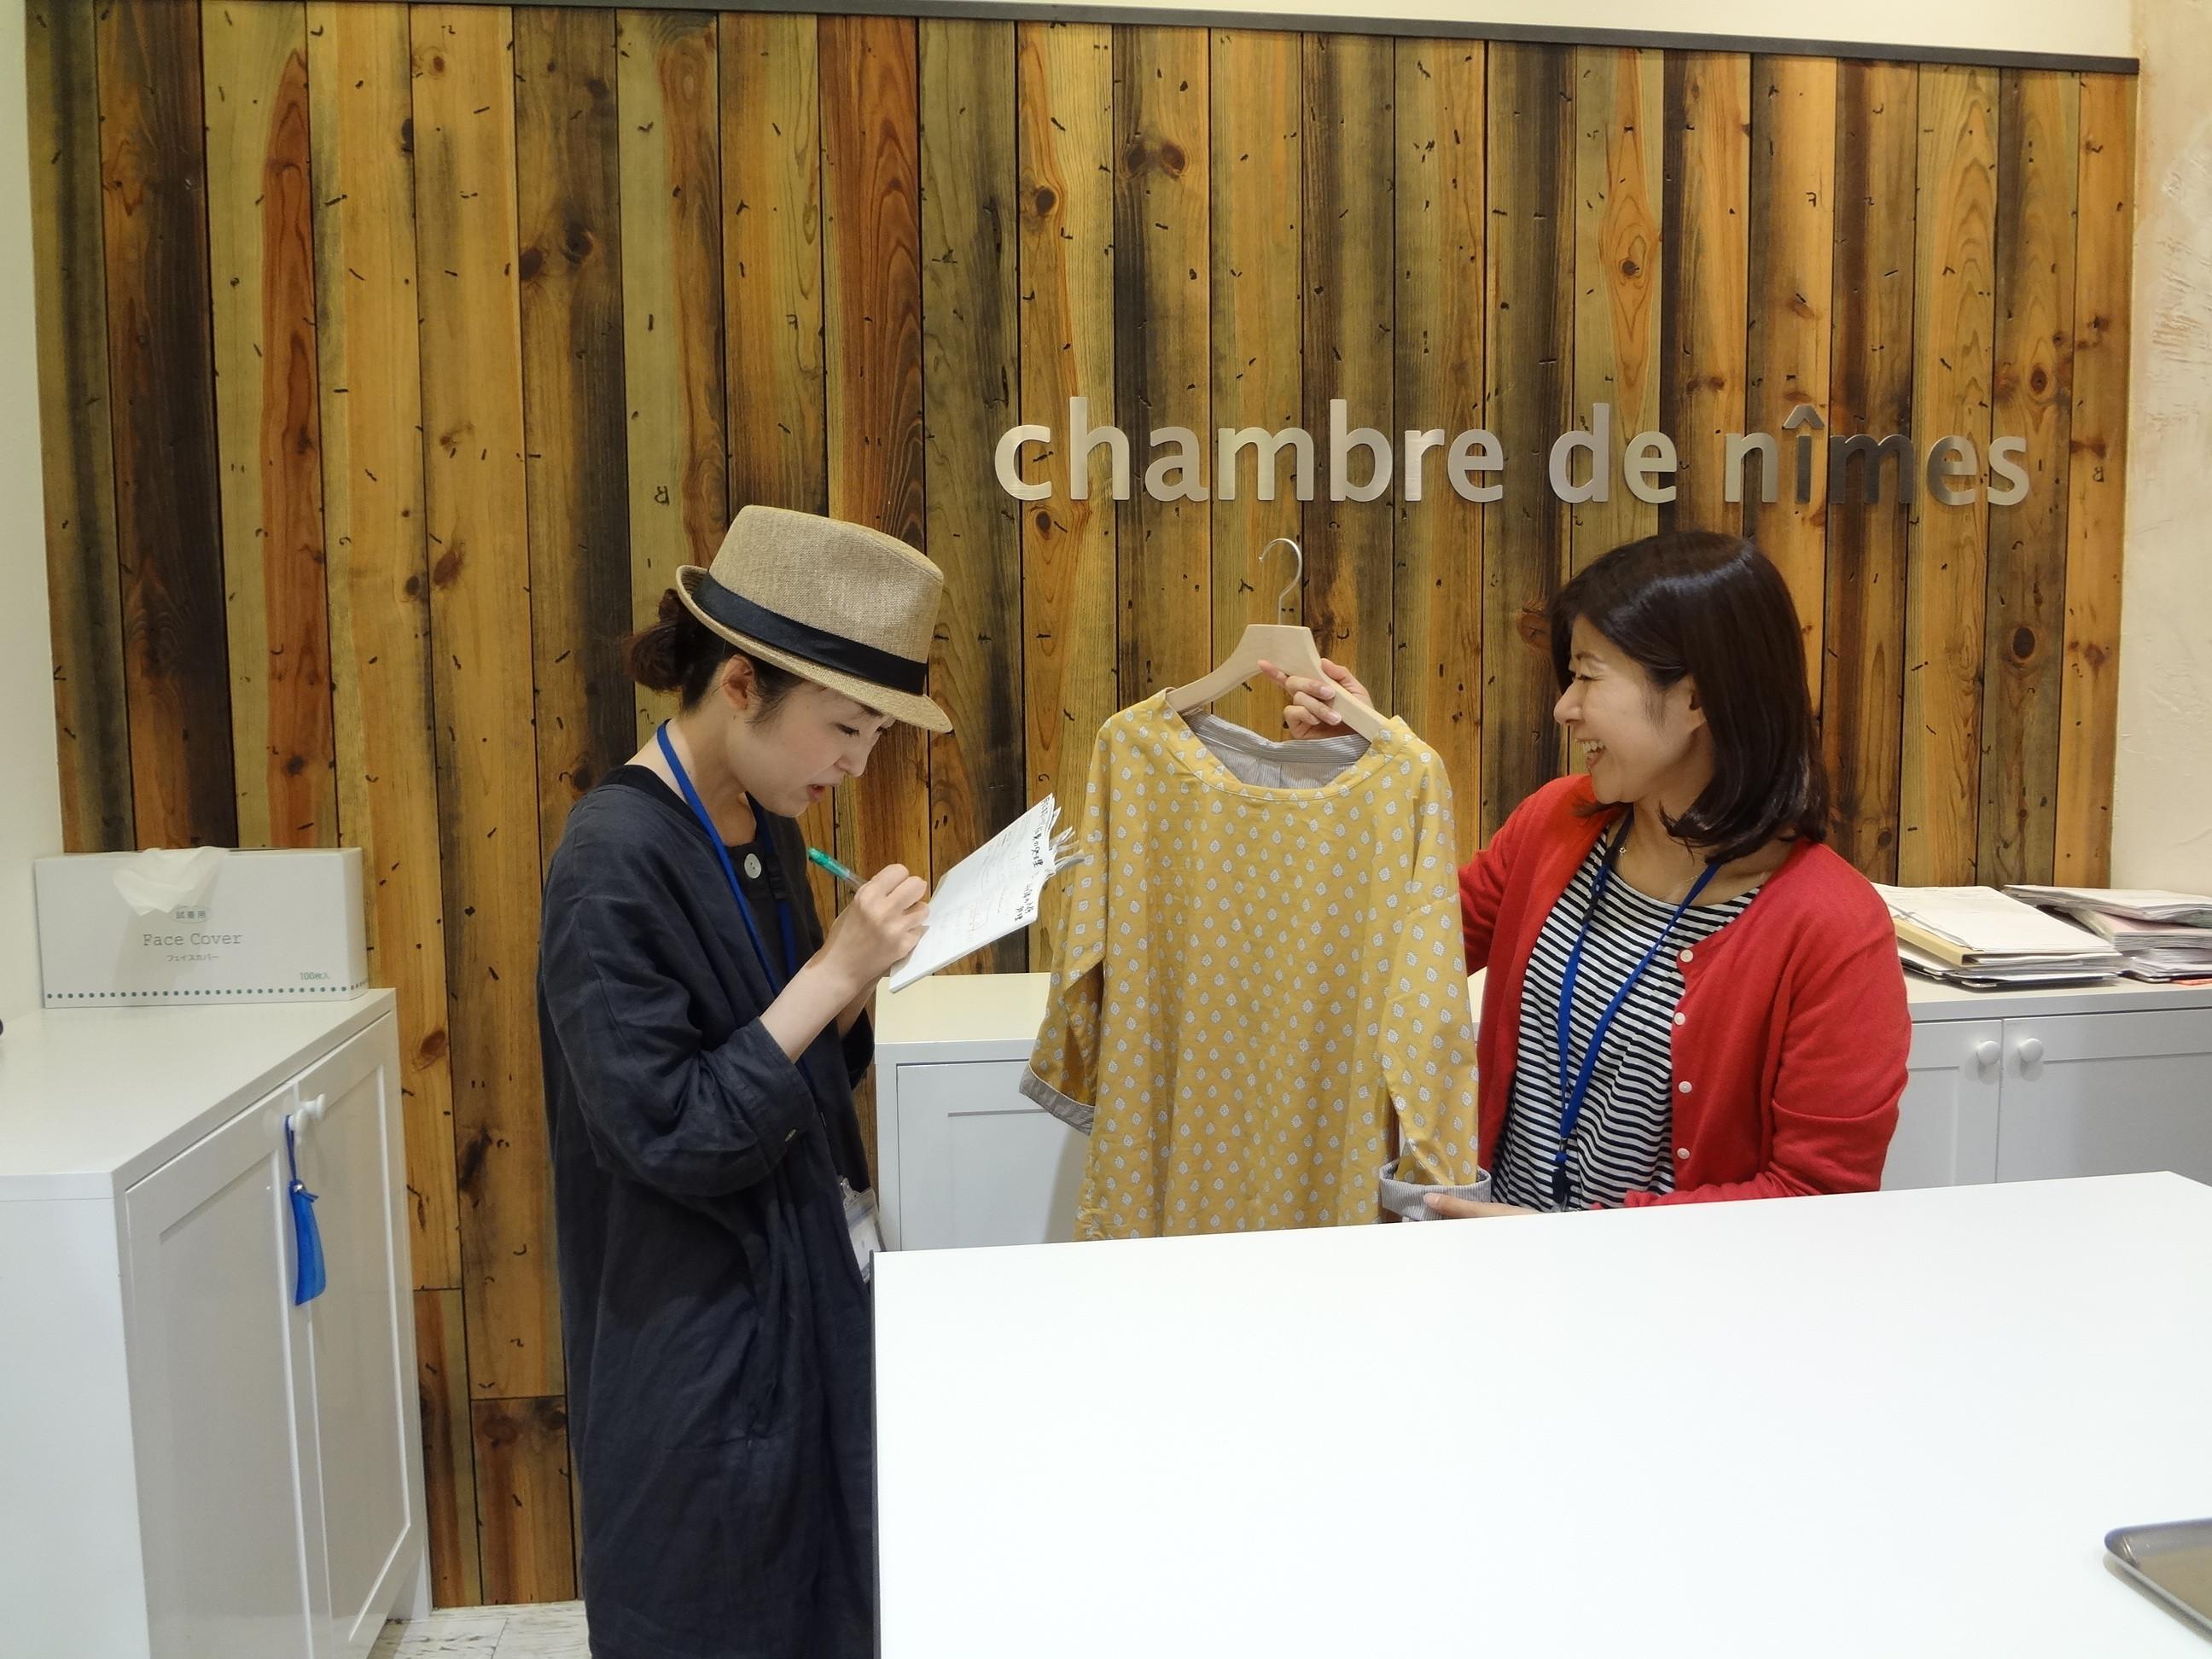 chambre de nimes(シャンブルドニーム) イオンモール福岡店のアルバイト情報